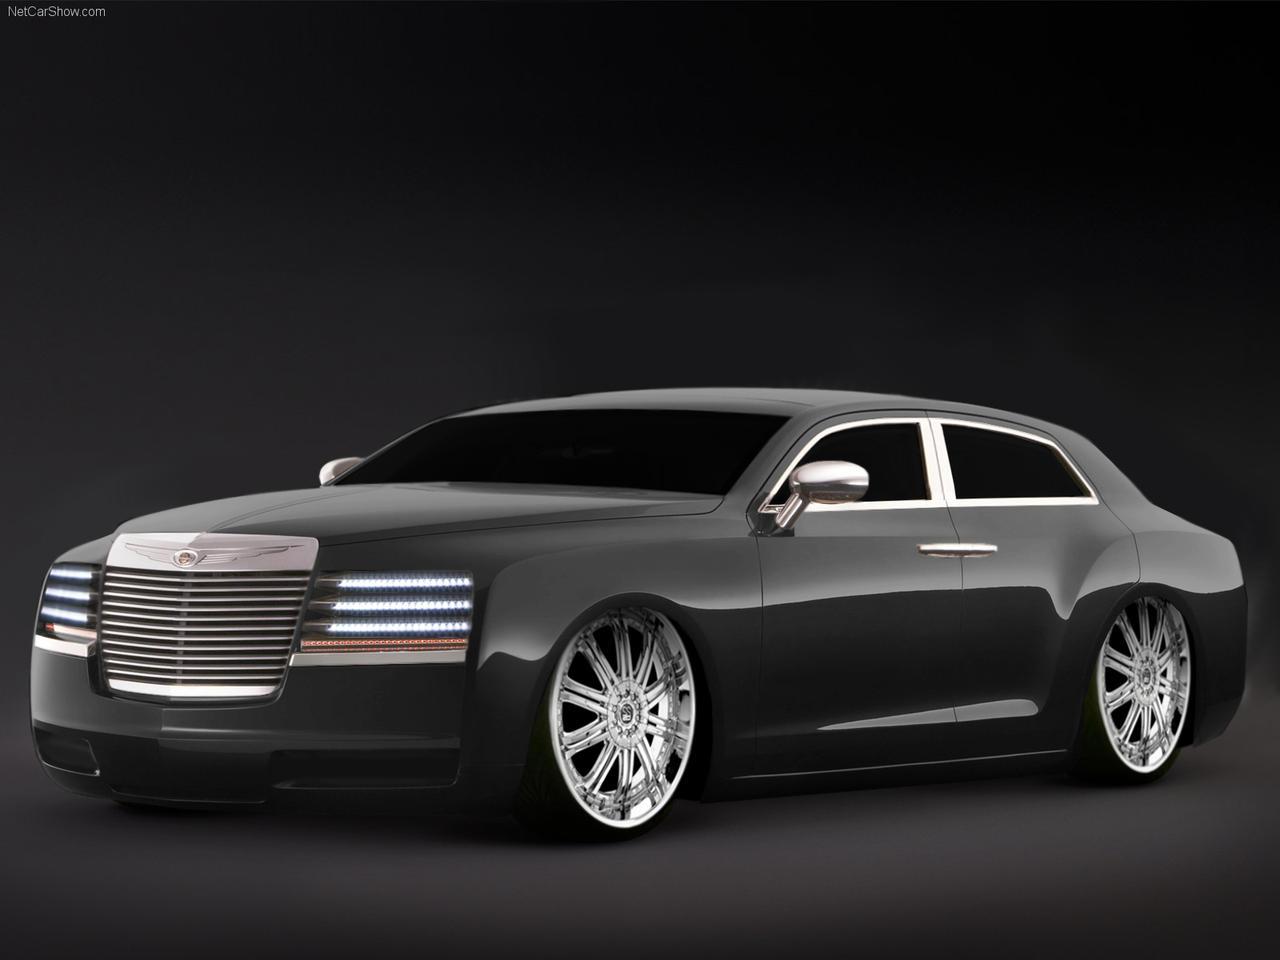 Chrysler Imperial - Z Concept by RandomExecutive